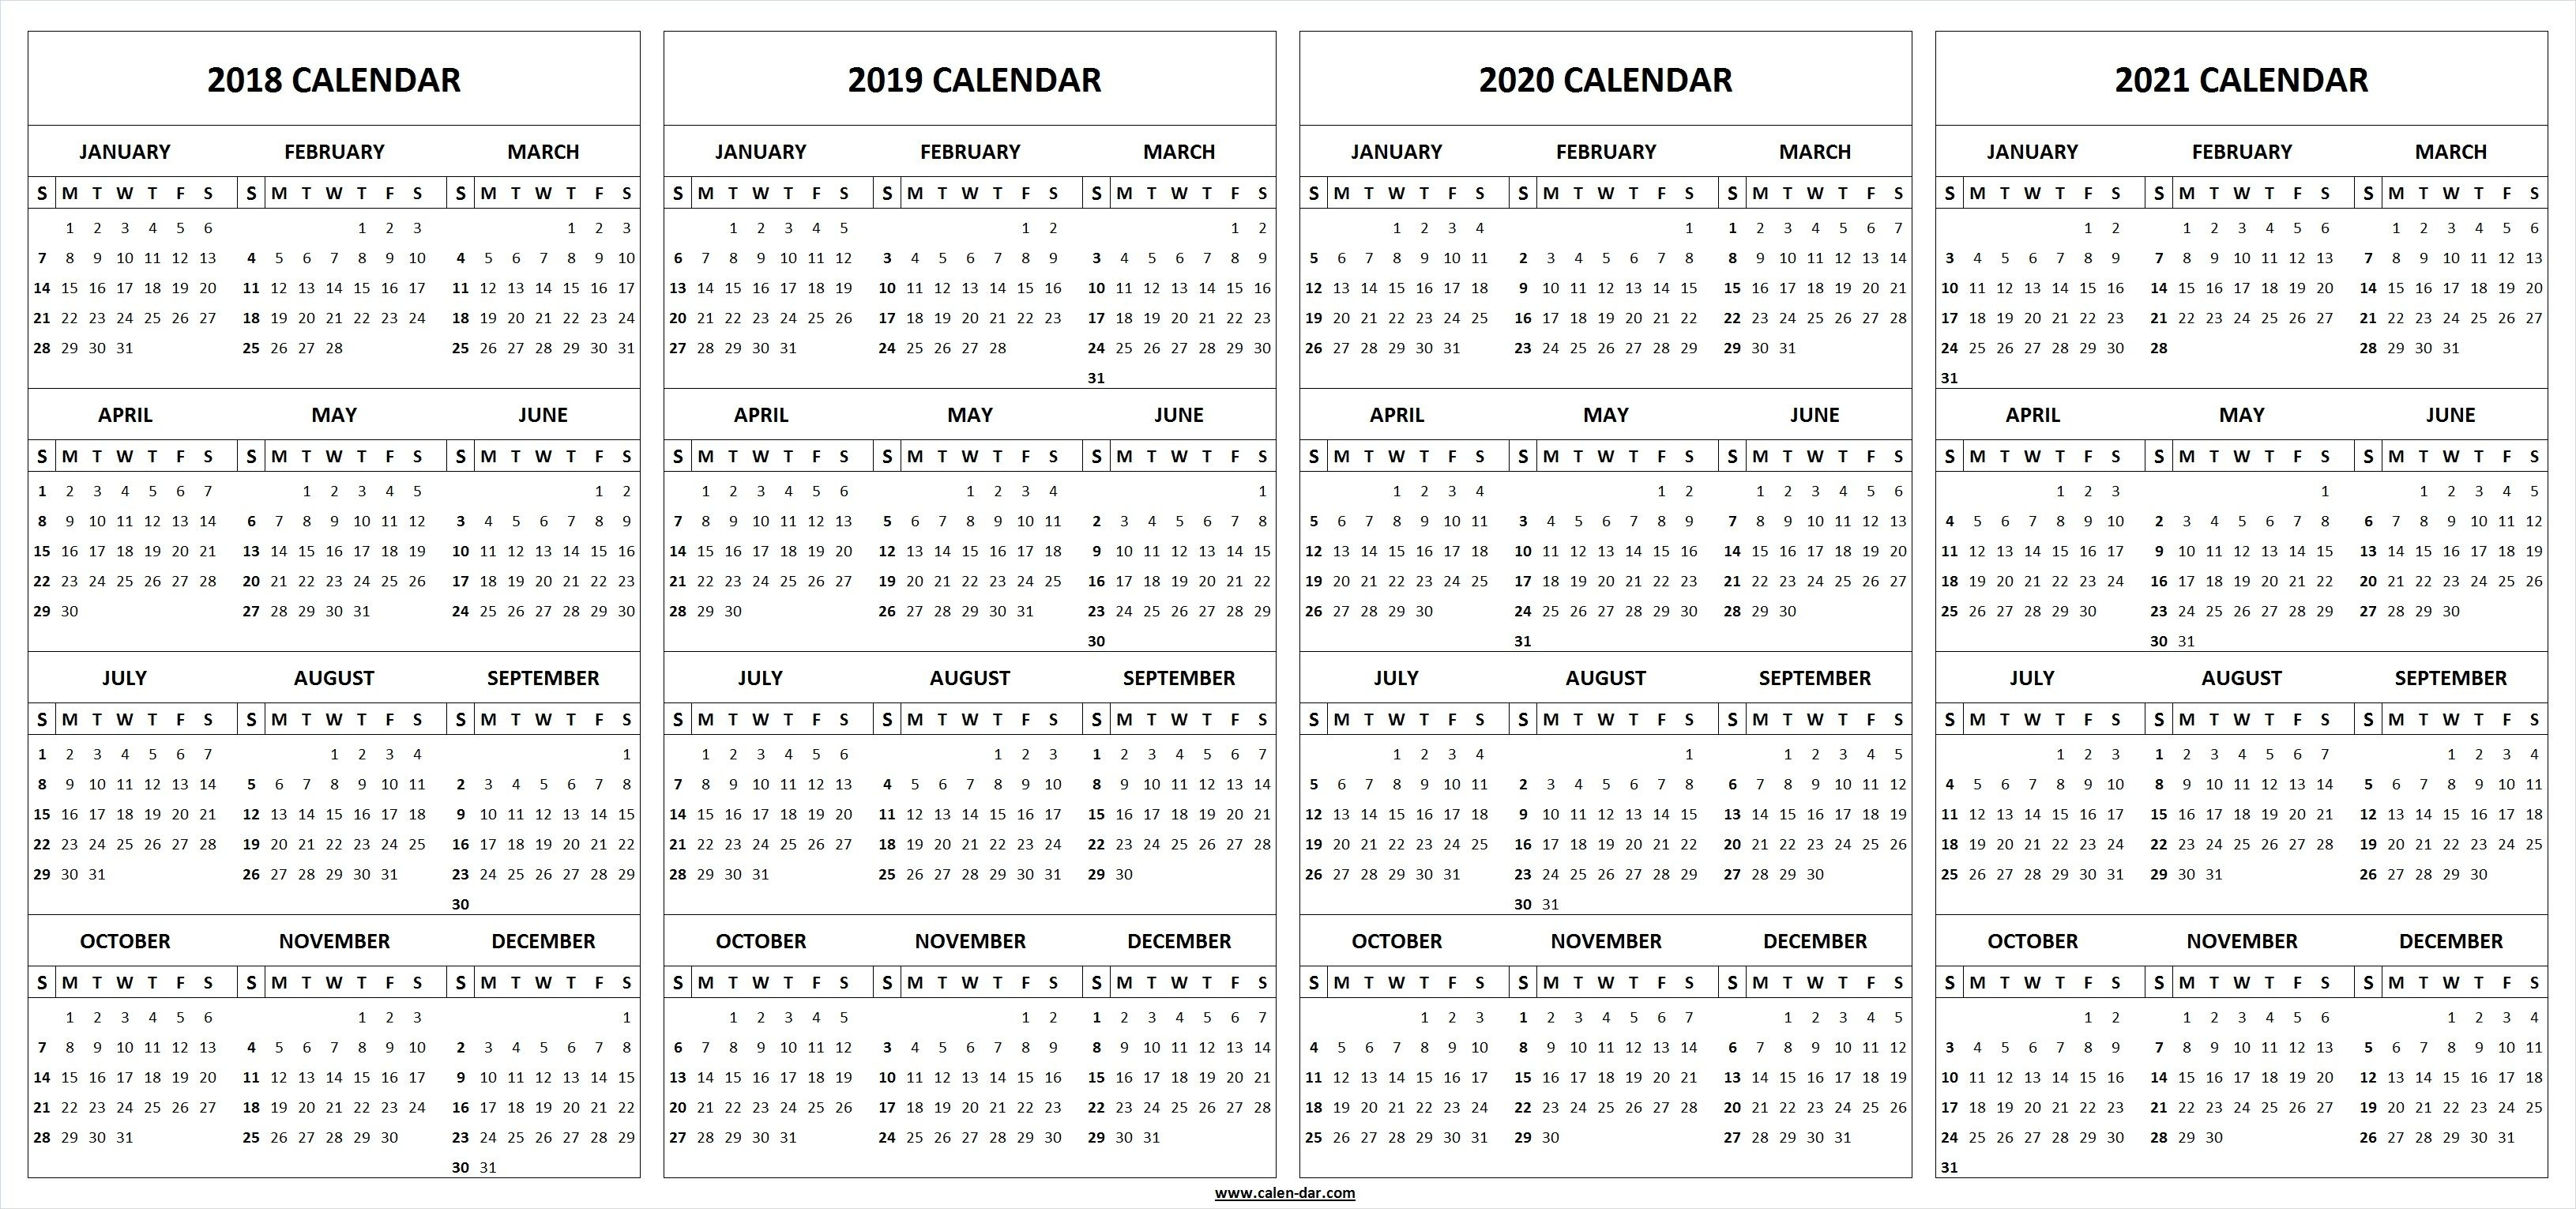 4 Four Year 2018 2019 2020 2021 Calendar Printable Template throughout 3 Year Calendar 2019 2020 2021